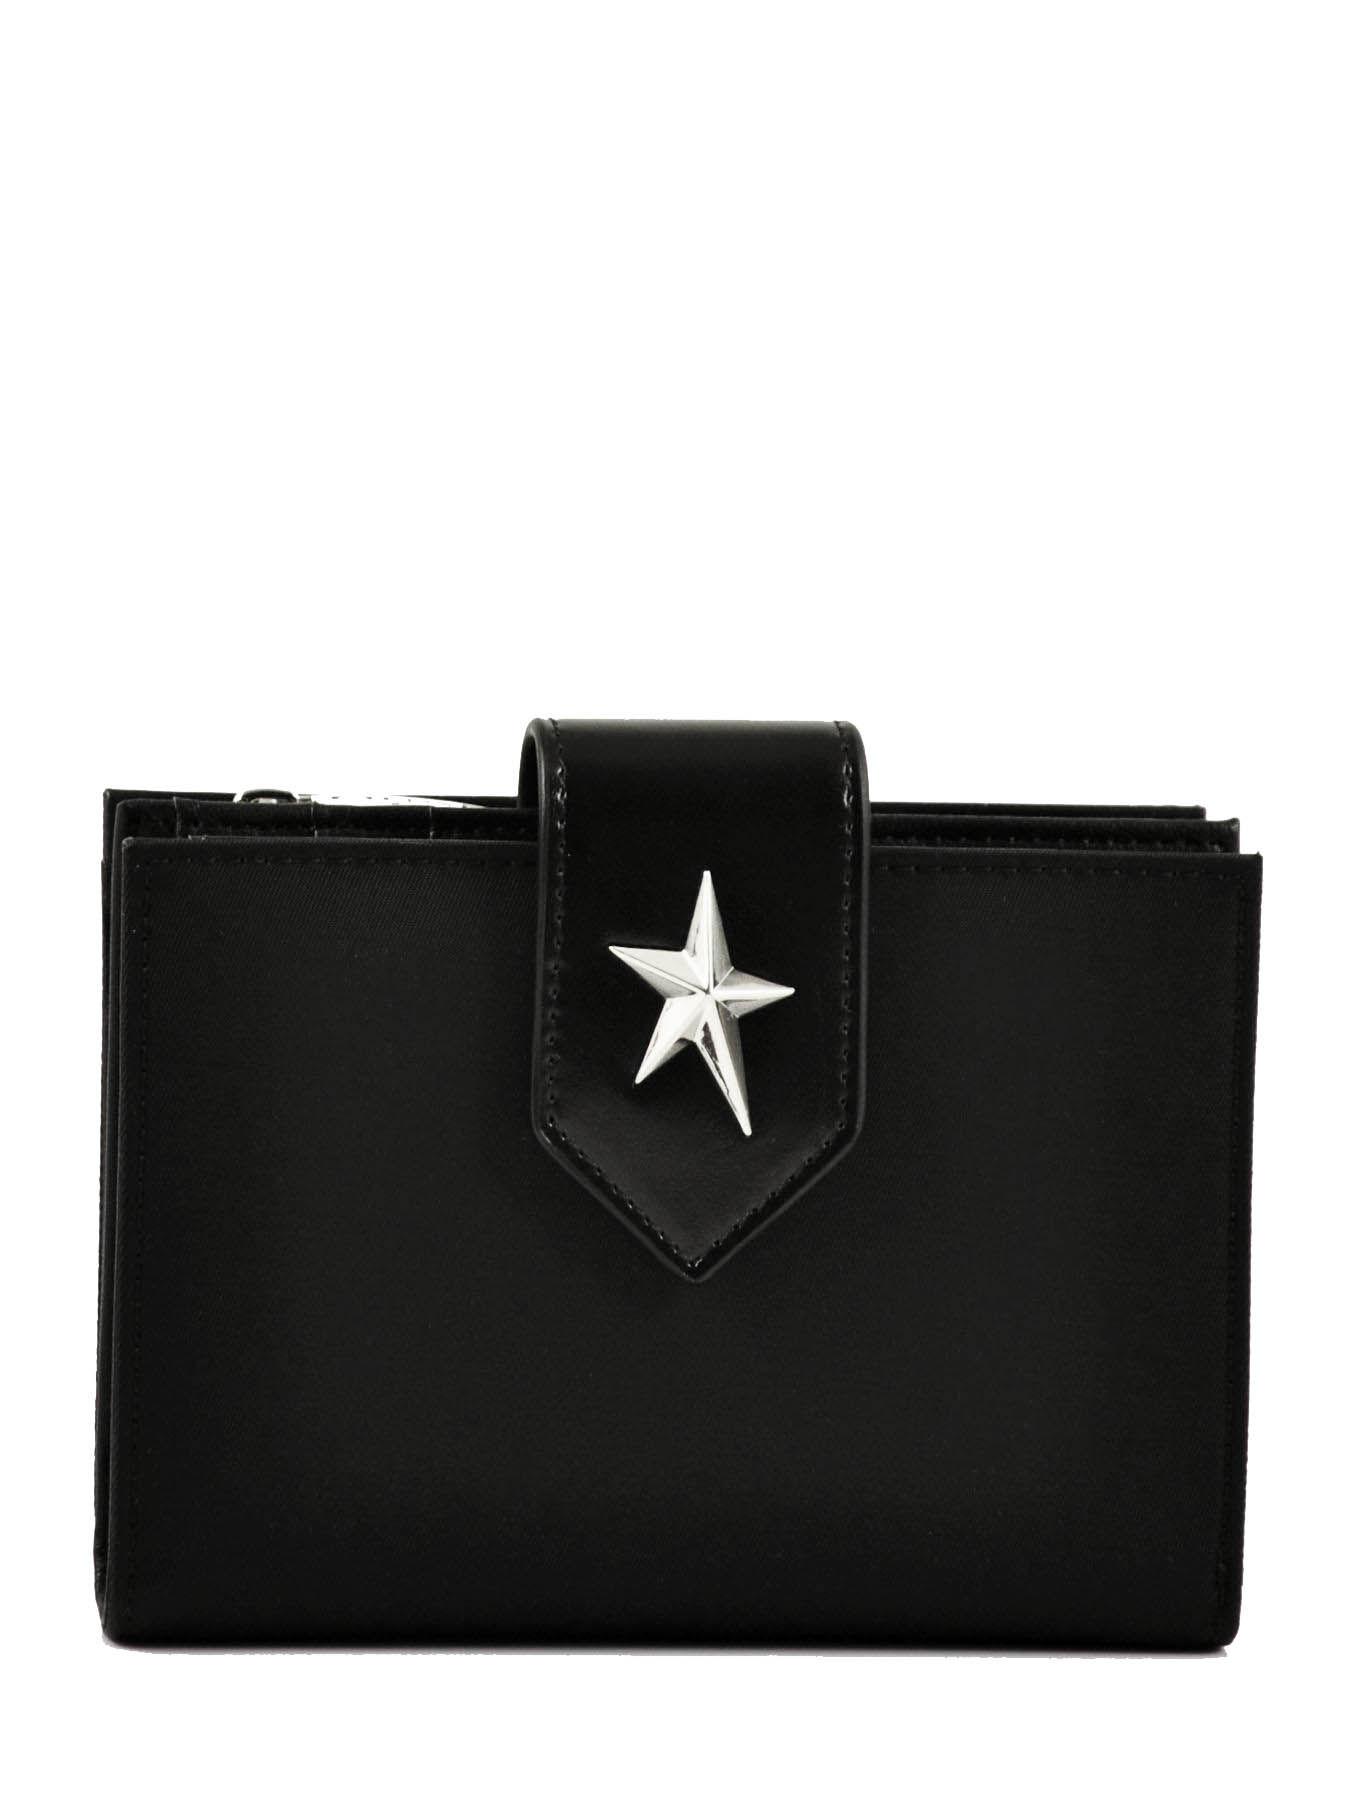 Porte monnaie thierry mugler noir zenith toile mt671w for Porte zenith